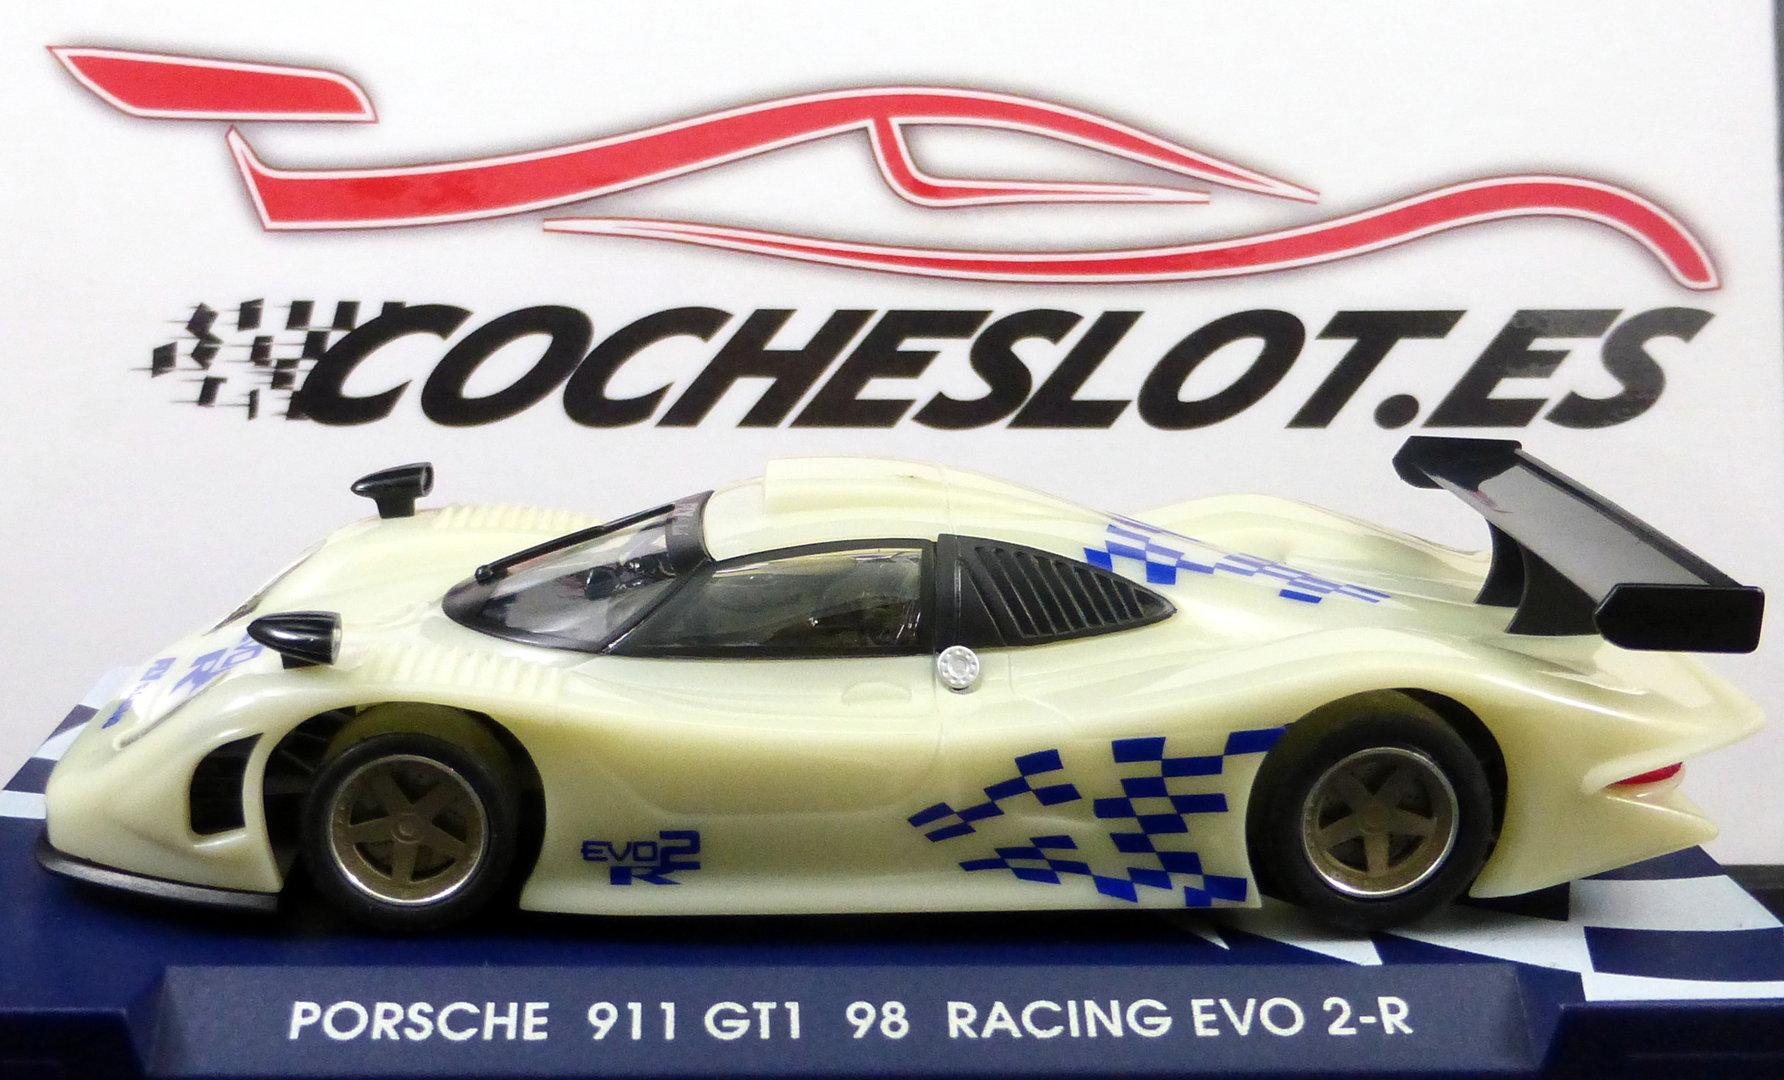 P1110277 Elegant Porsche 911 Gt1 Evo Fly Cars Trend